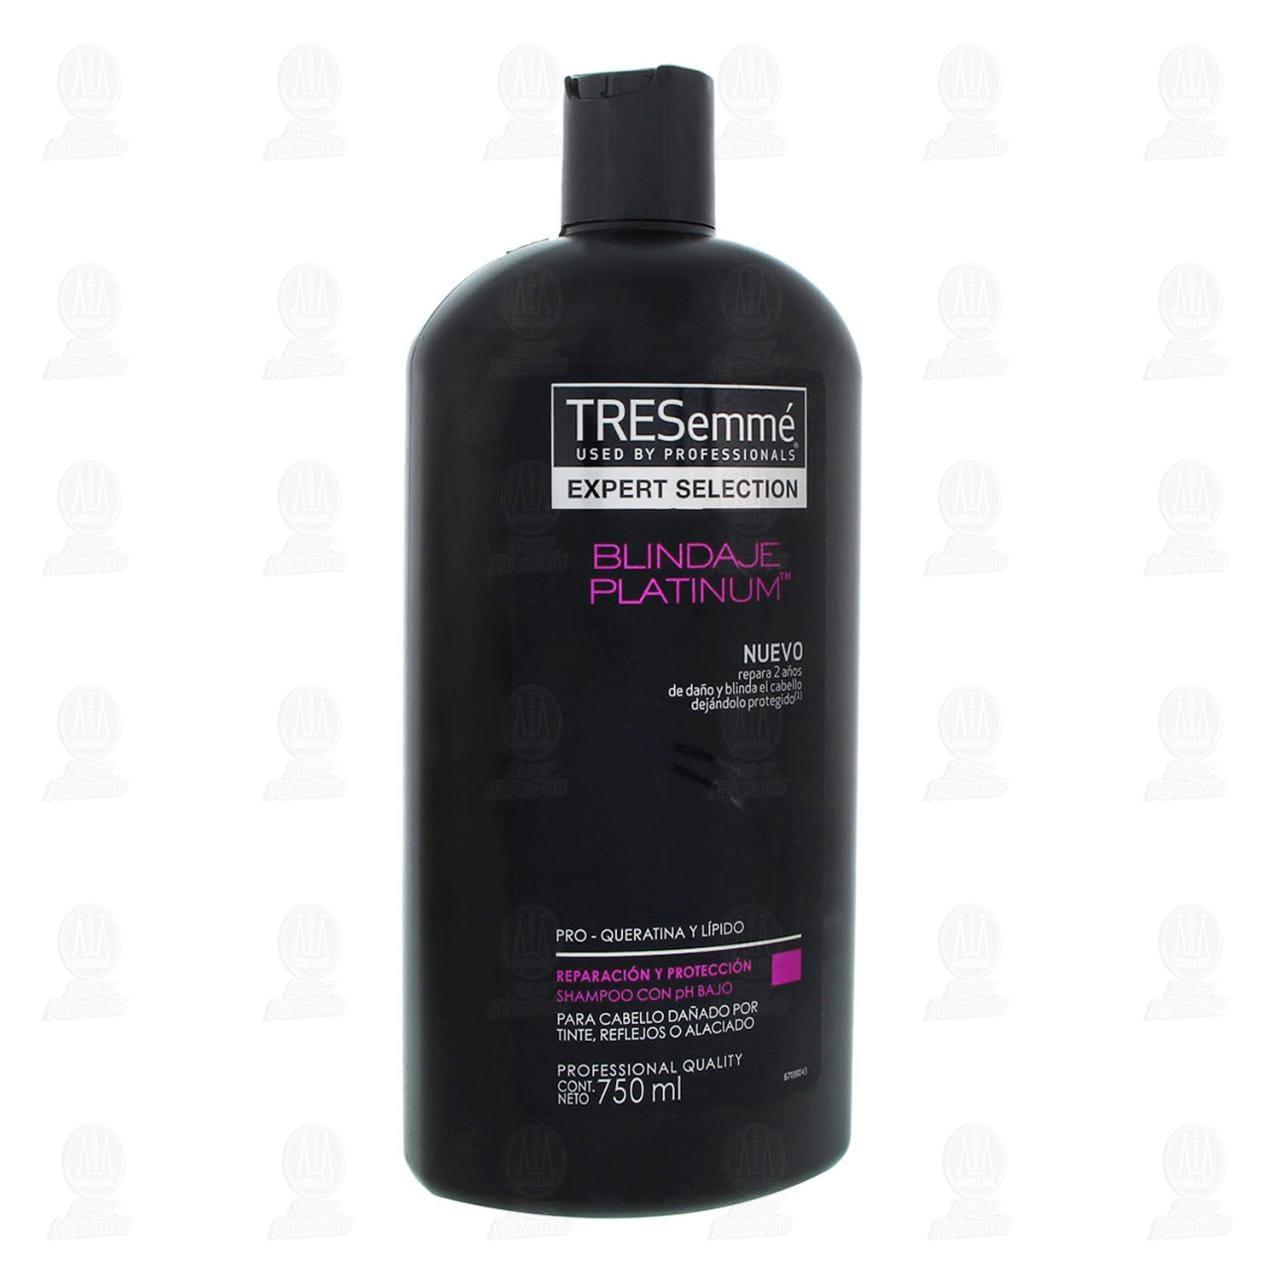 Comprar Shampoo Tresemmé Blindaje Platinum Pro-Queratina y Lípido, 750 ml. en Farmacias Guadalajara